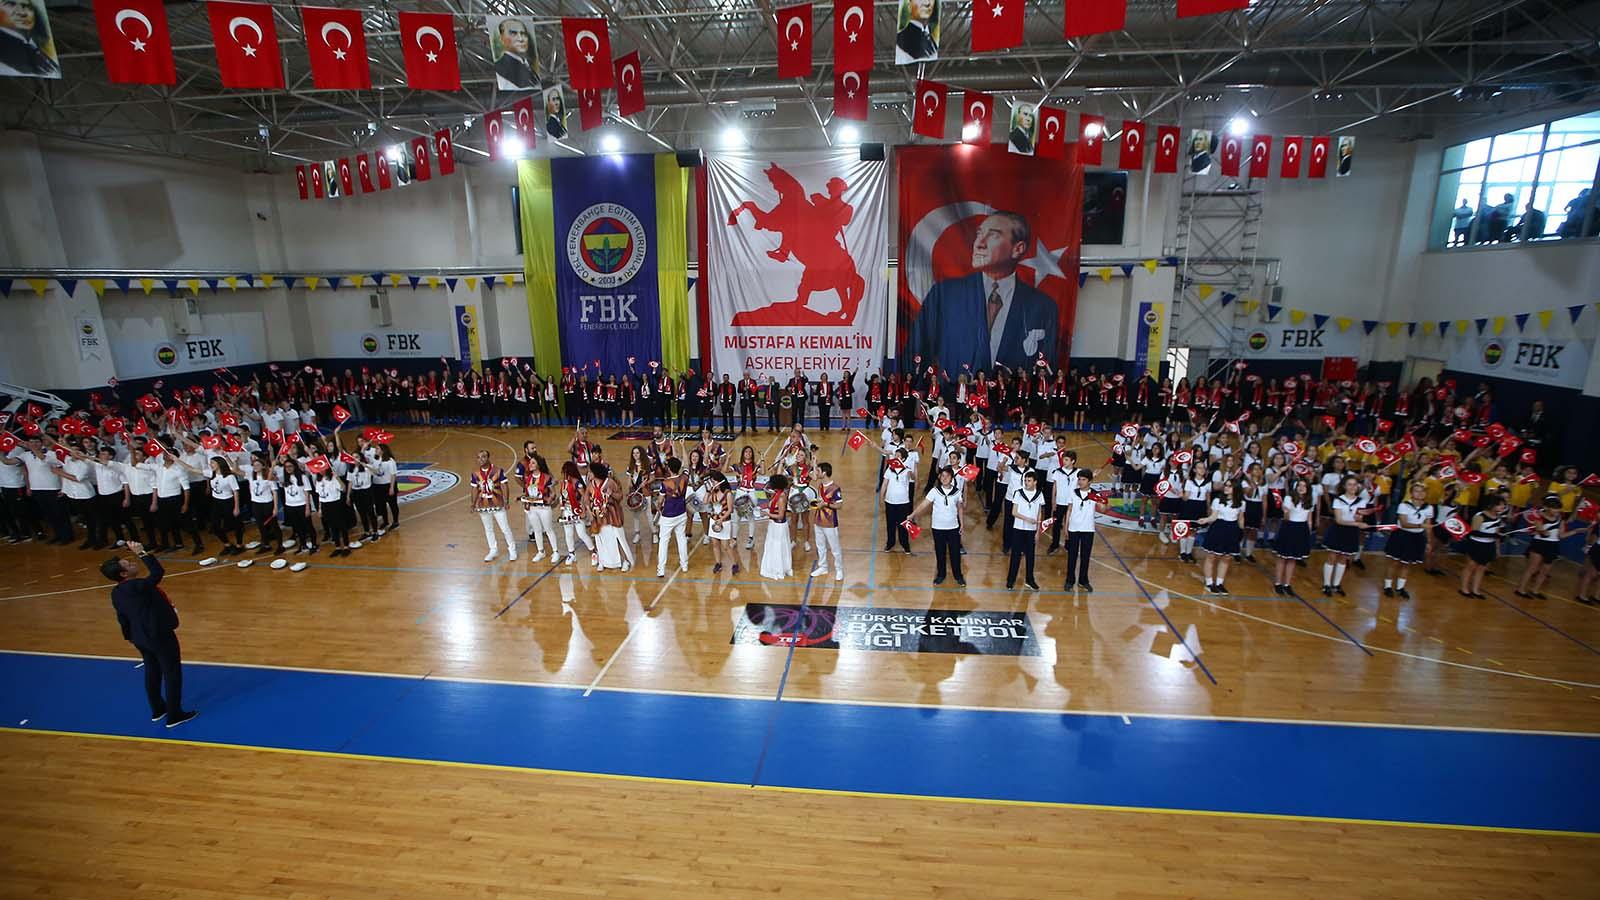 Fenerbahçe Koleji'nde 19 Mayıs coşkusu